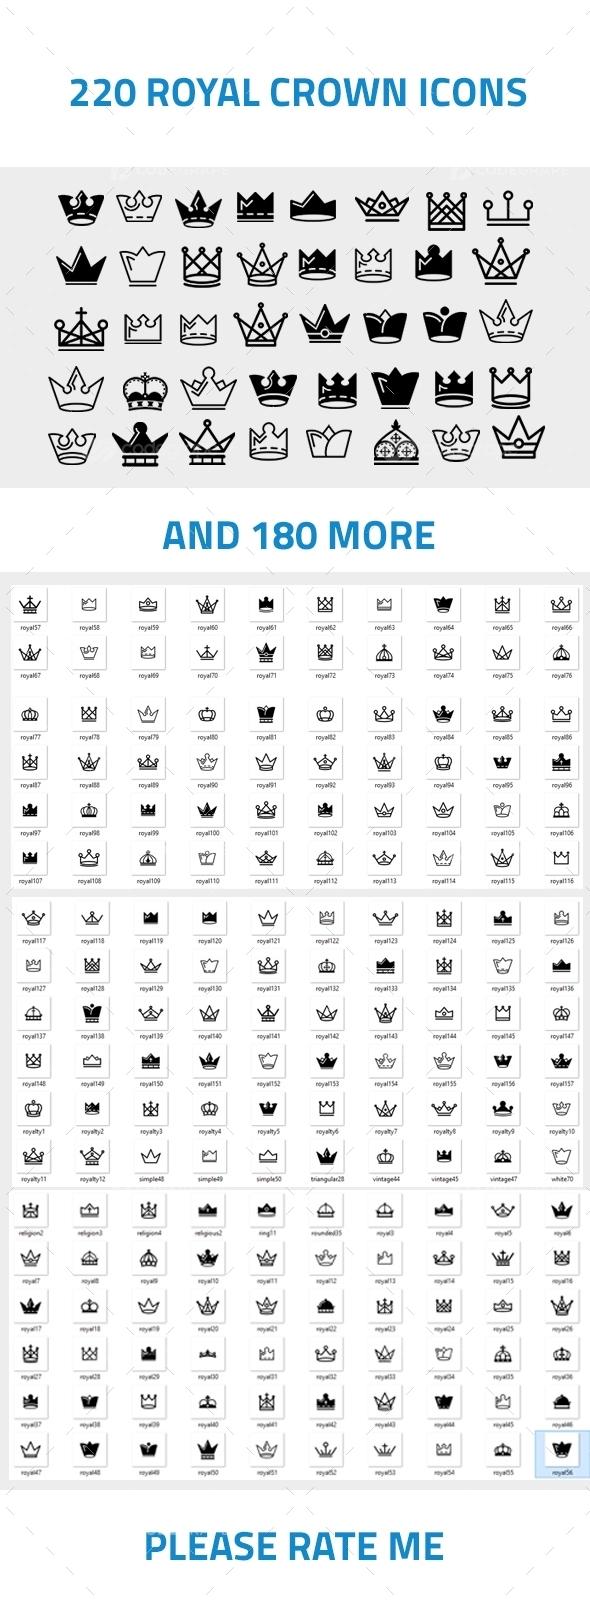 200+ Royal Crown Icons Mega Pack